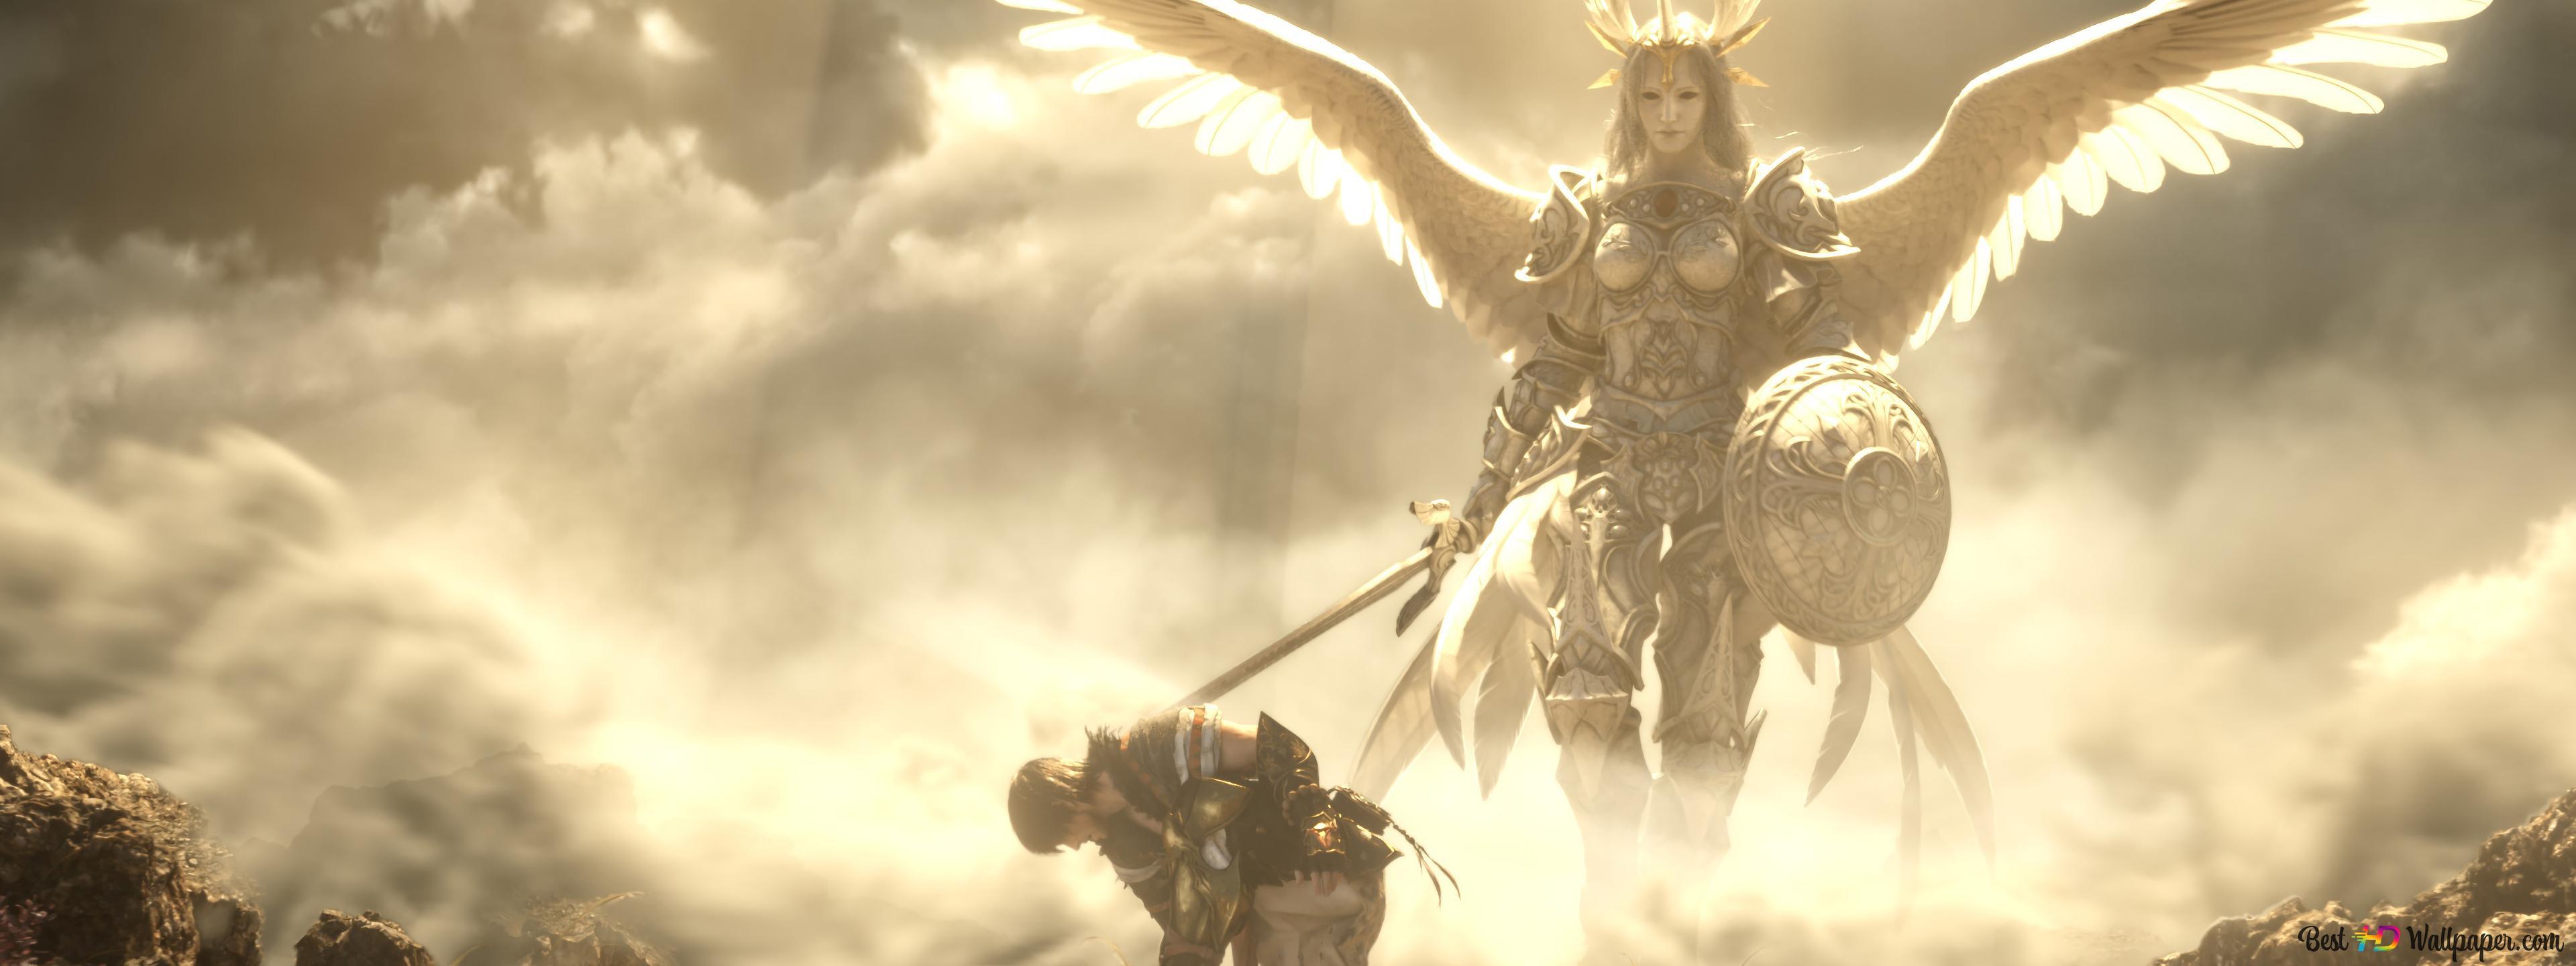 Final Fantasy Xiv Shadowbringers Samurai Angel Hd Wallpaper